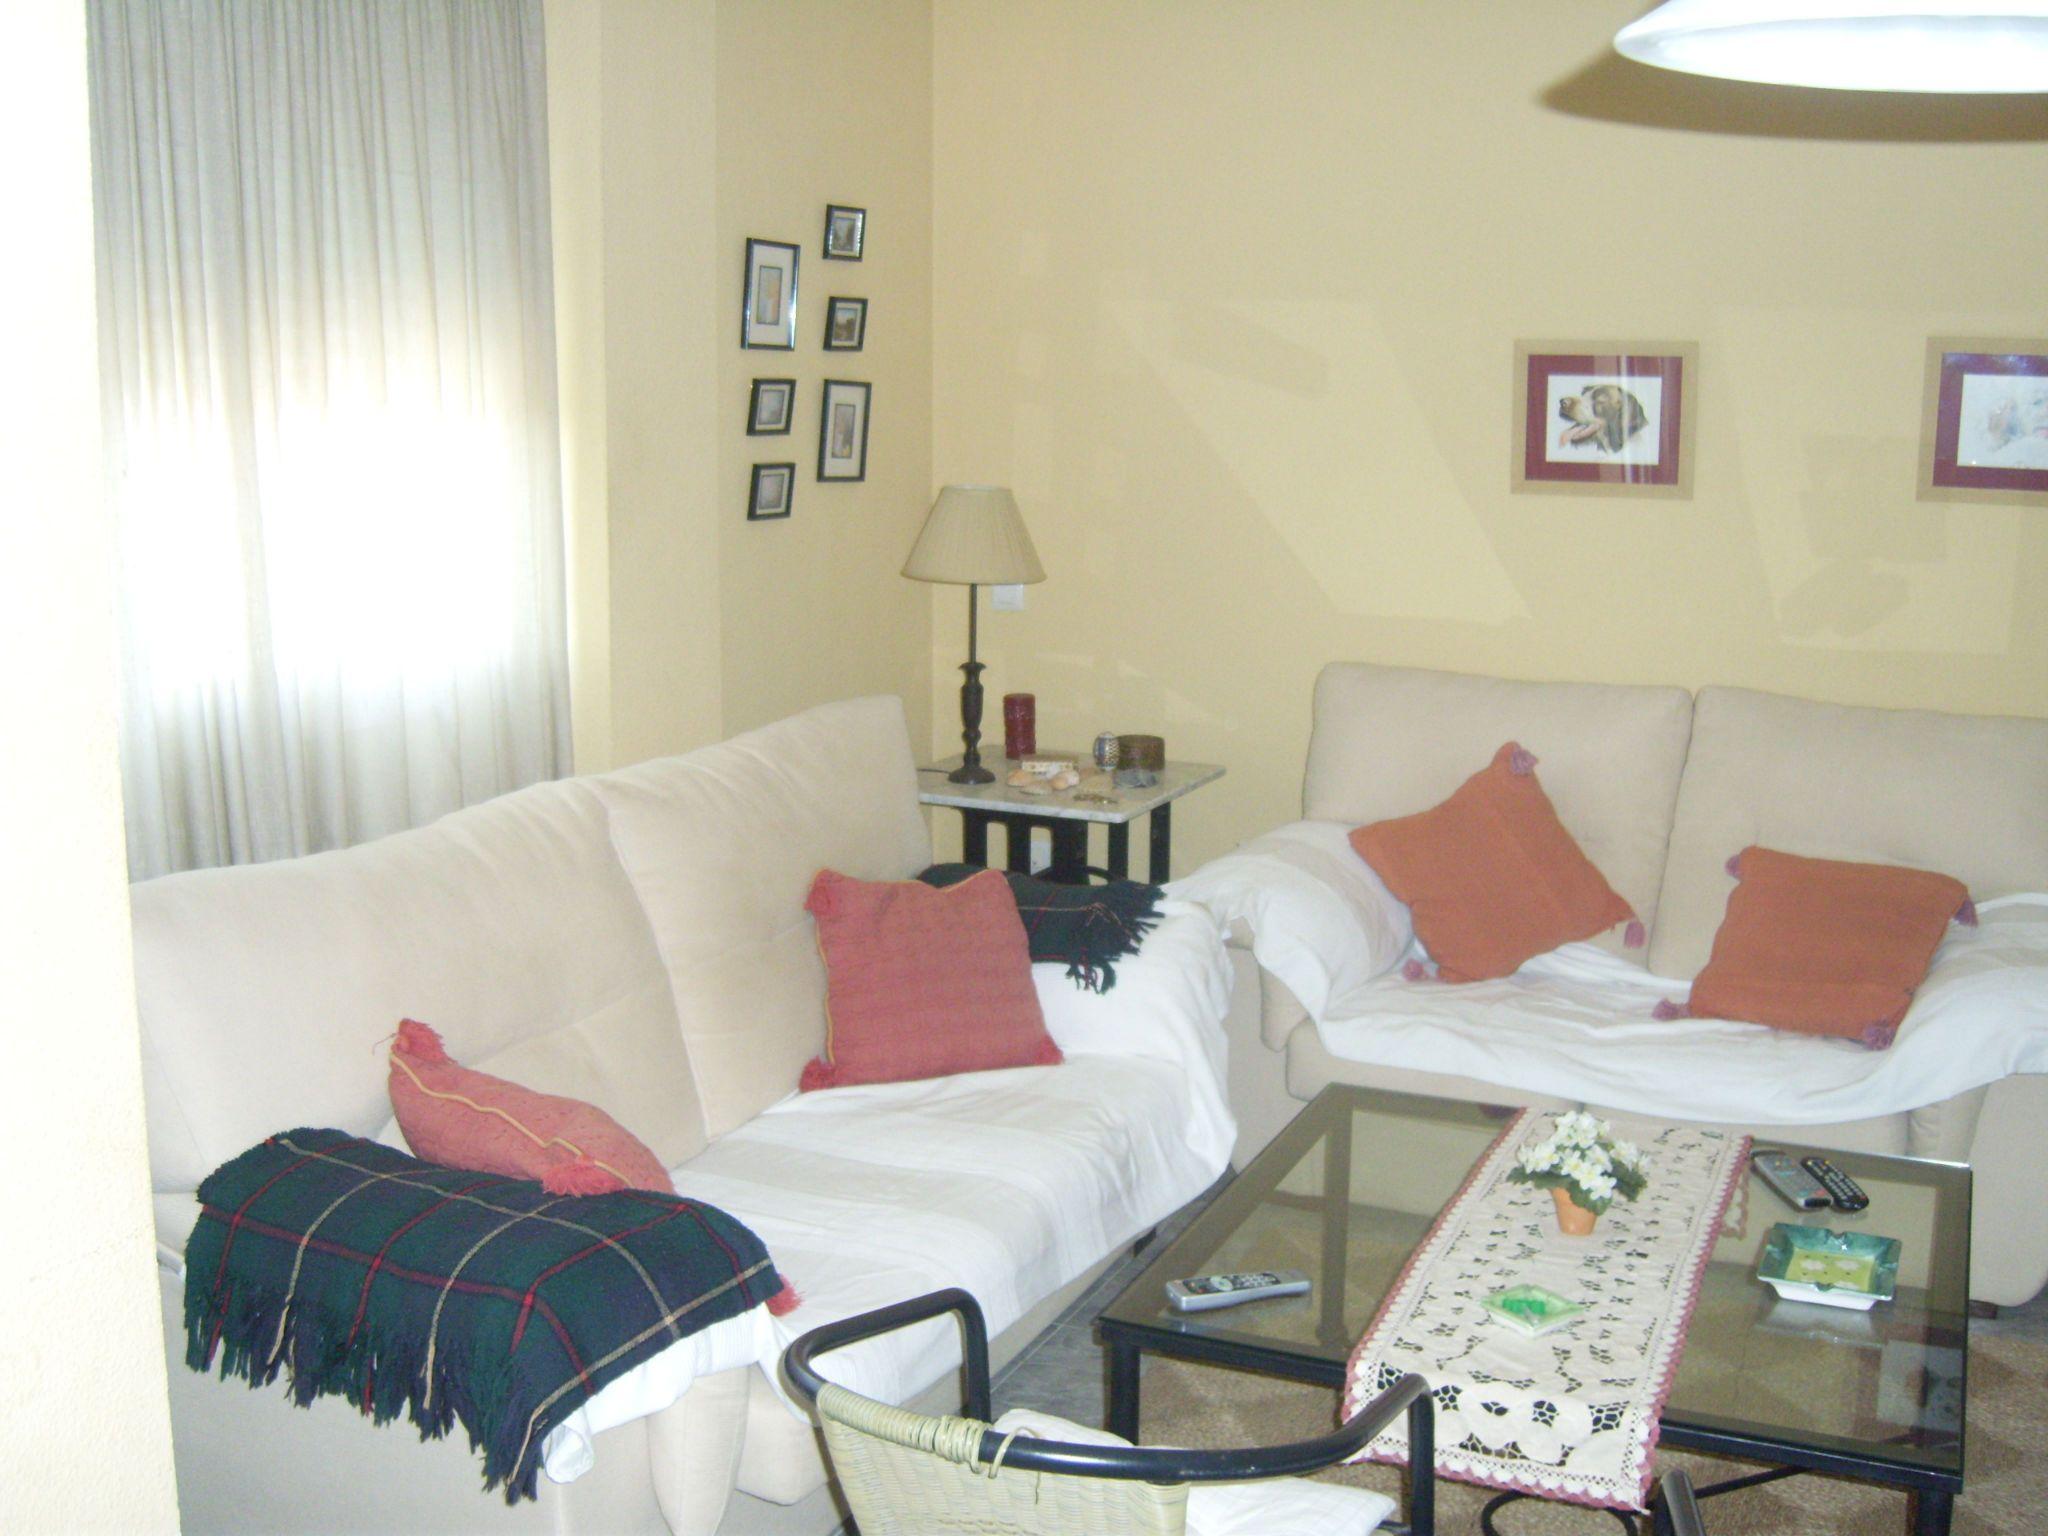 Apartamento en Isla cristina con Cocina y Balcón